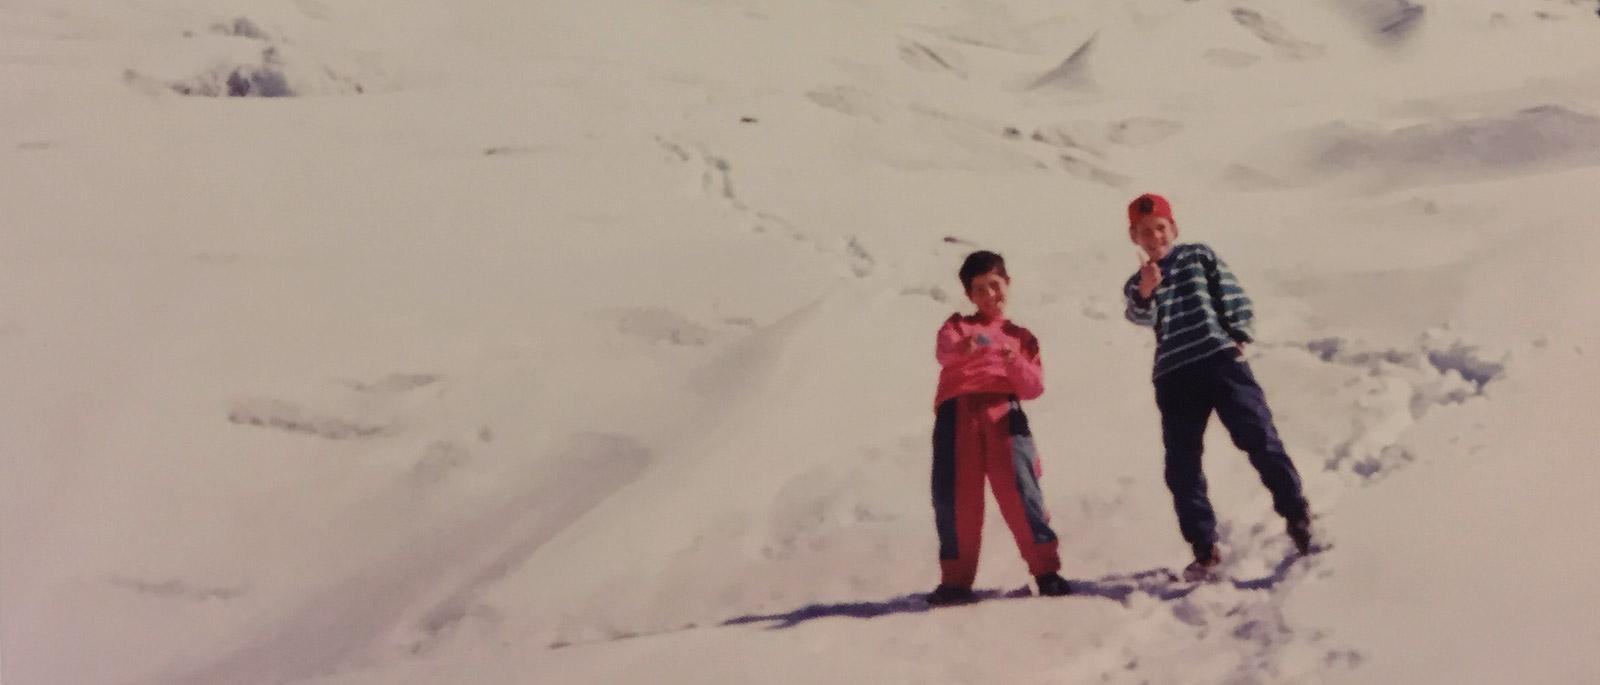 Morado hanging glacier: a childhood memory